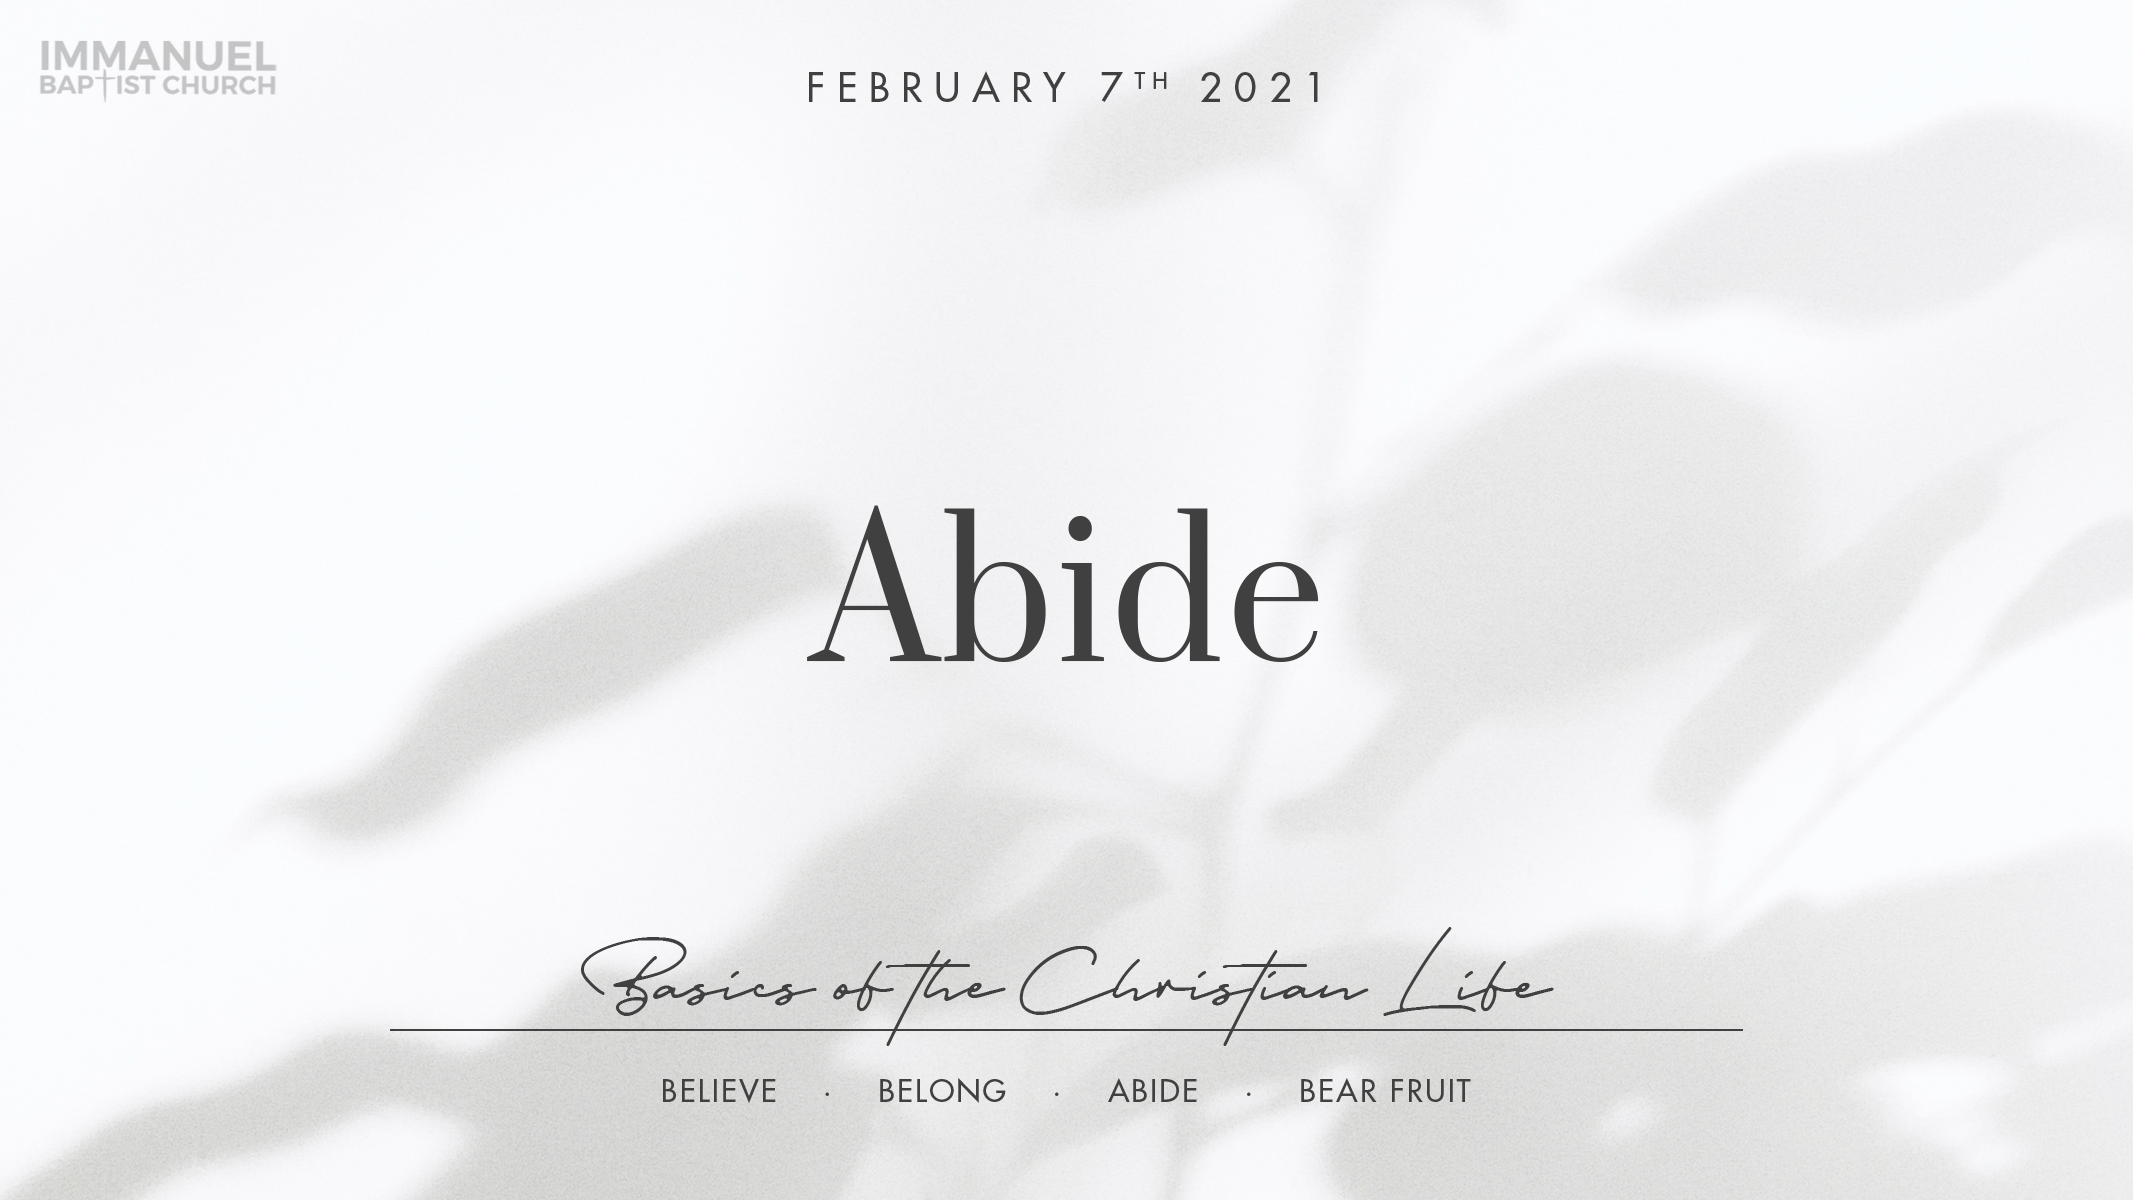 Abide Image